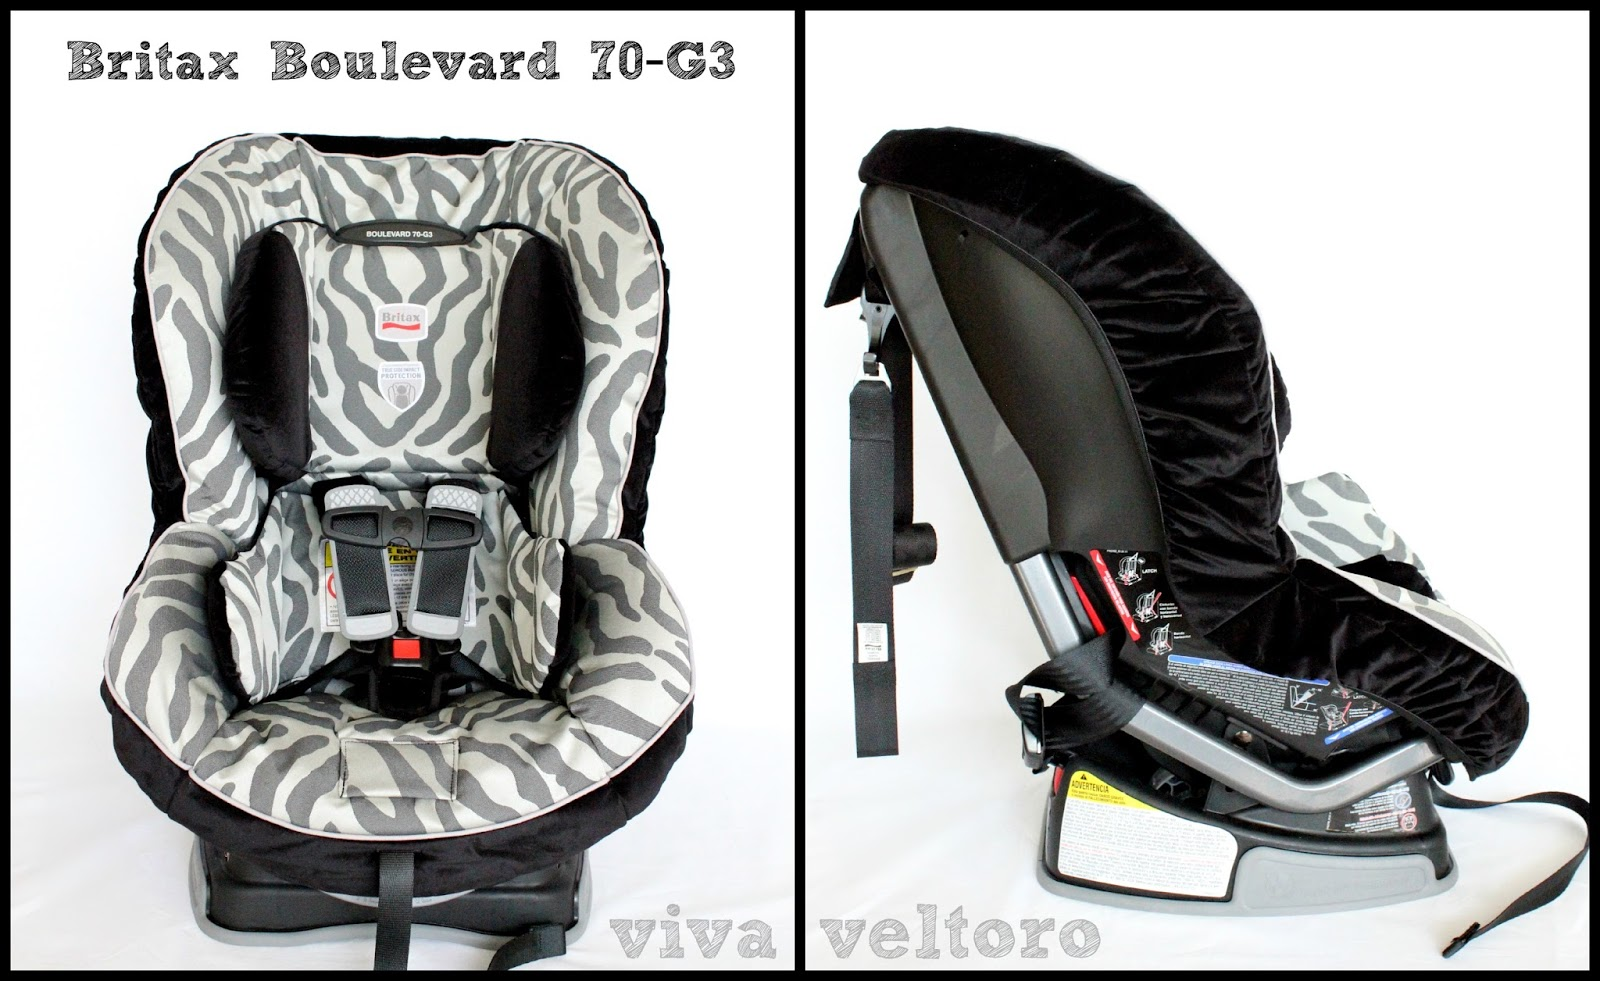 Car Seat Giveaway: Eco-Babyz: Britax Boulevard 70-G3 Car Seat Giveaway